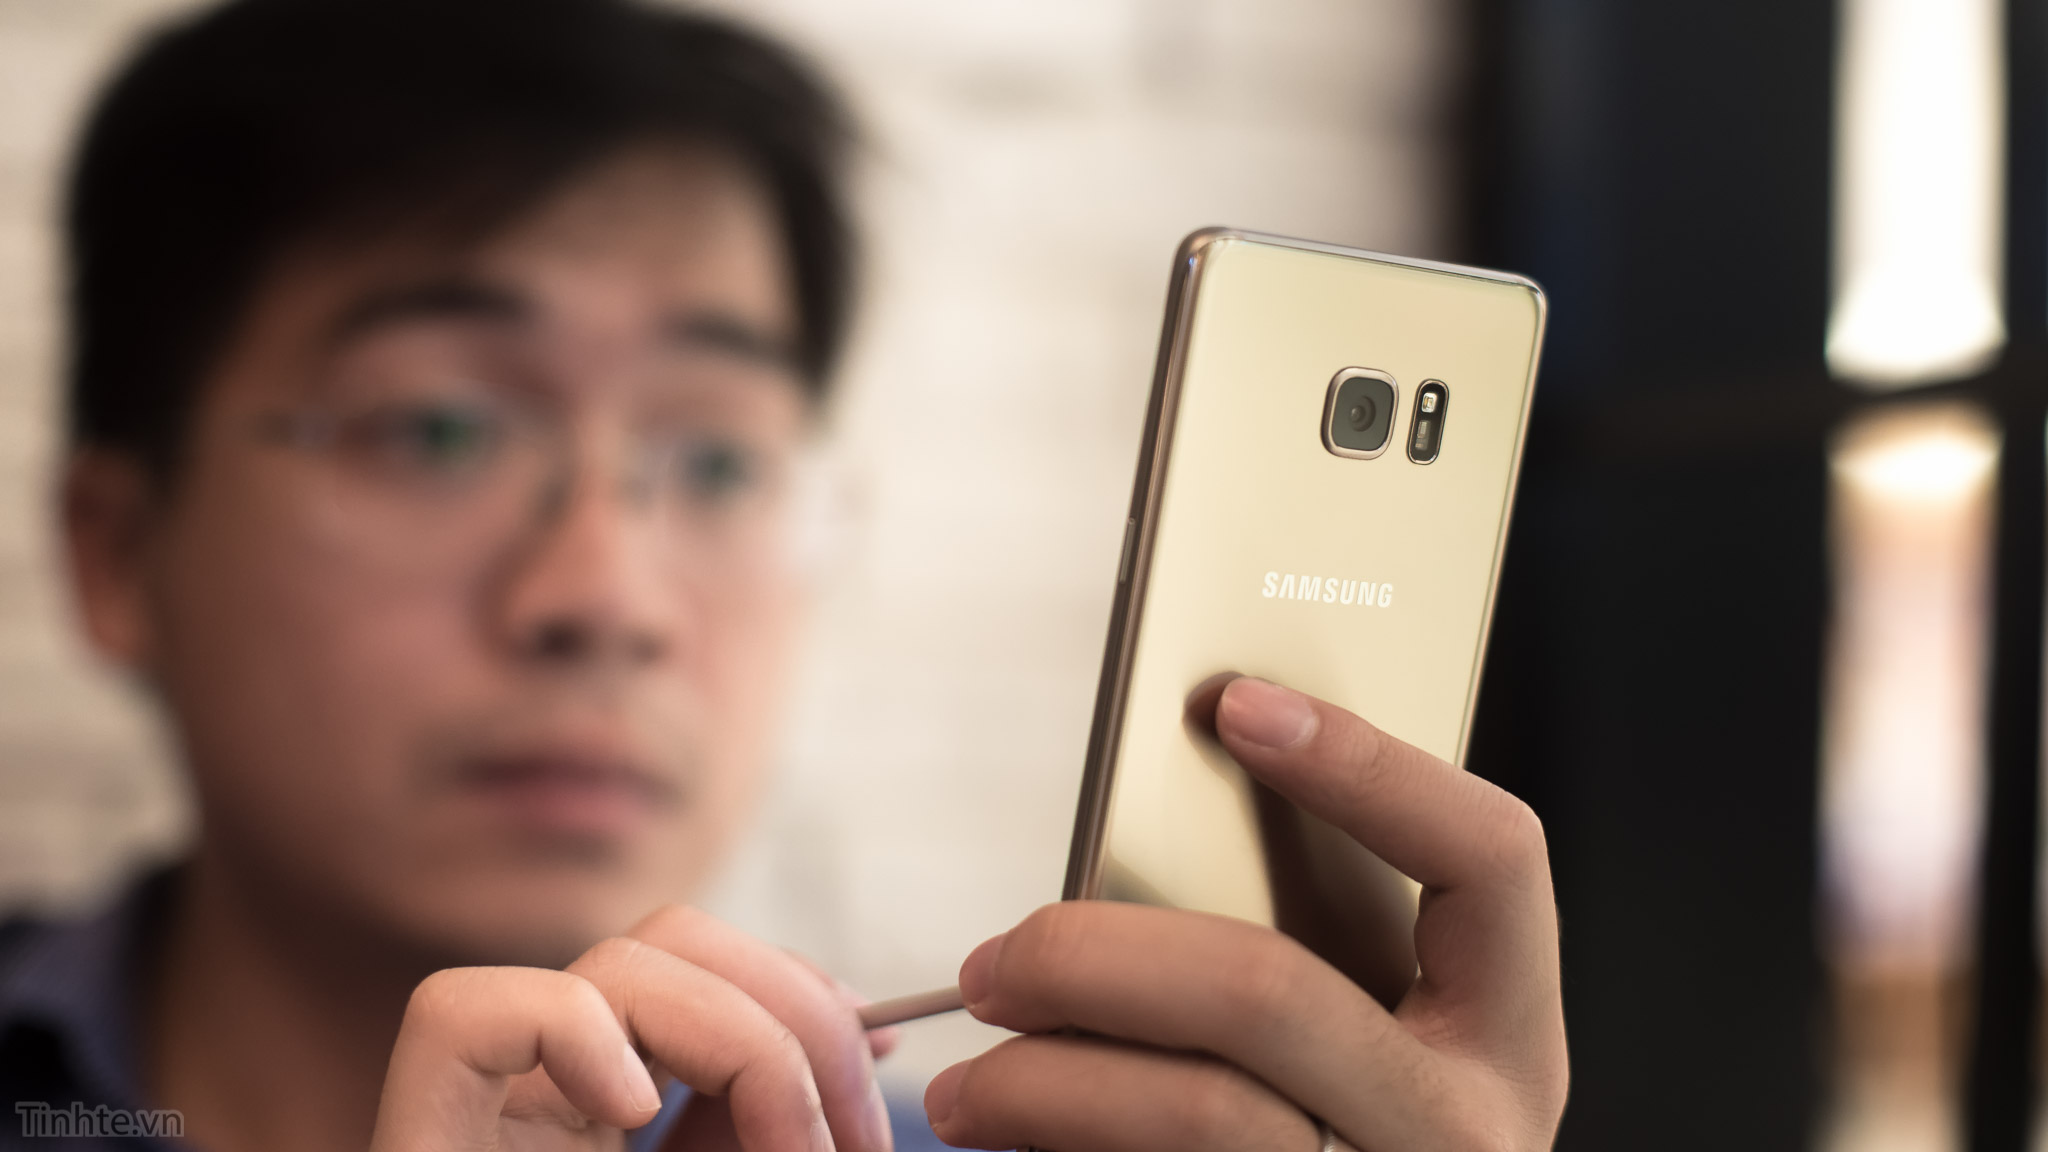 Samsung_Galaxy_Note_7_review_tinhte.vn-3.jpg